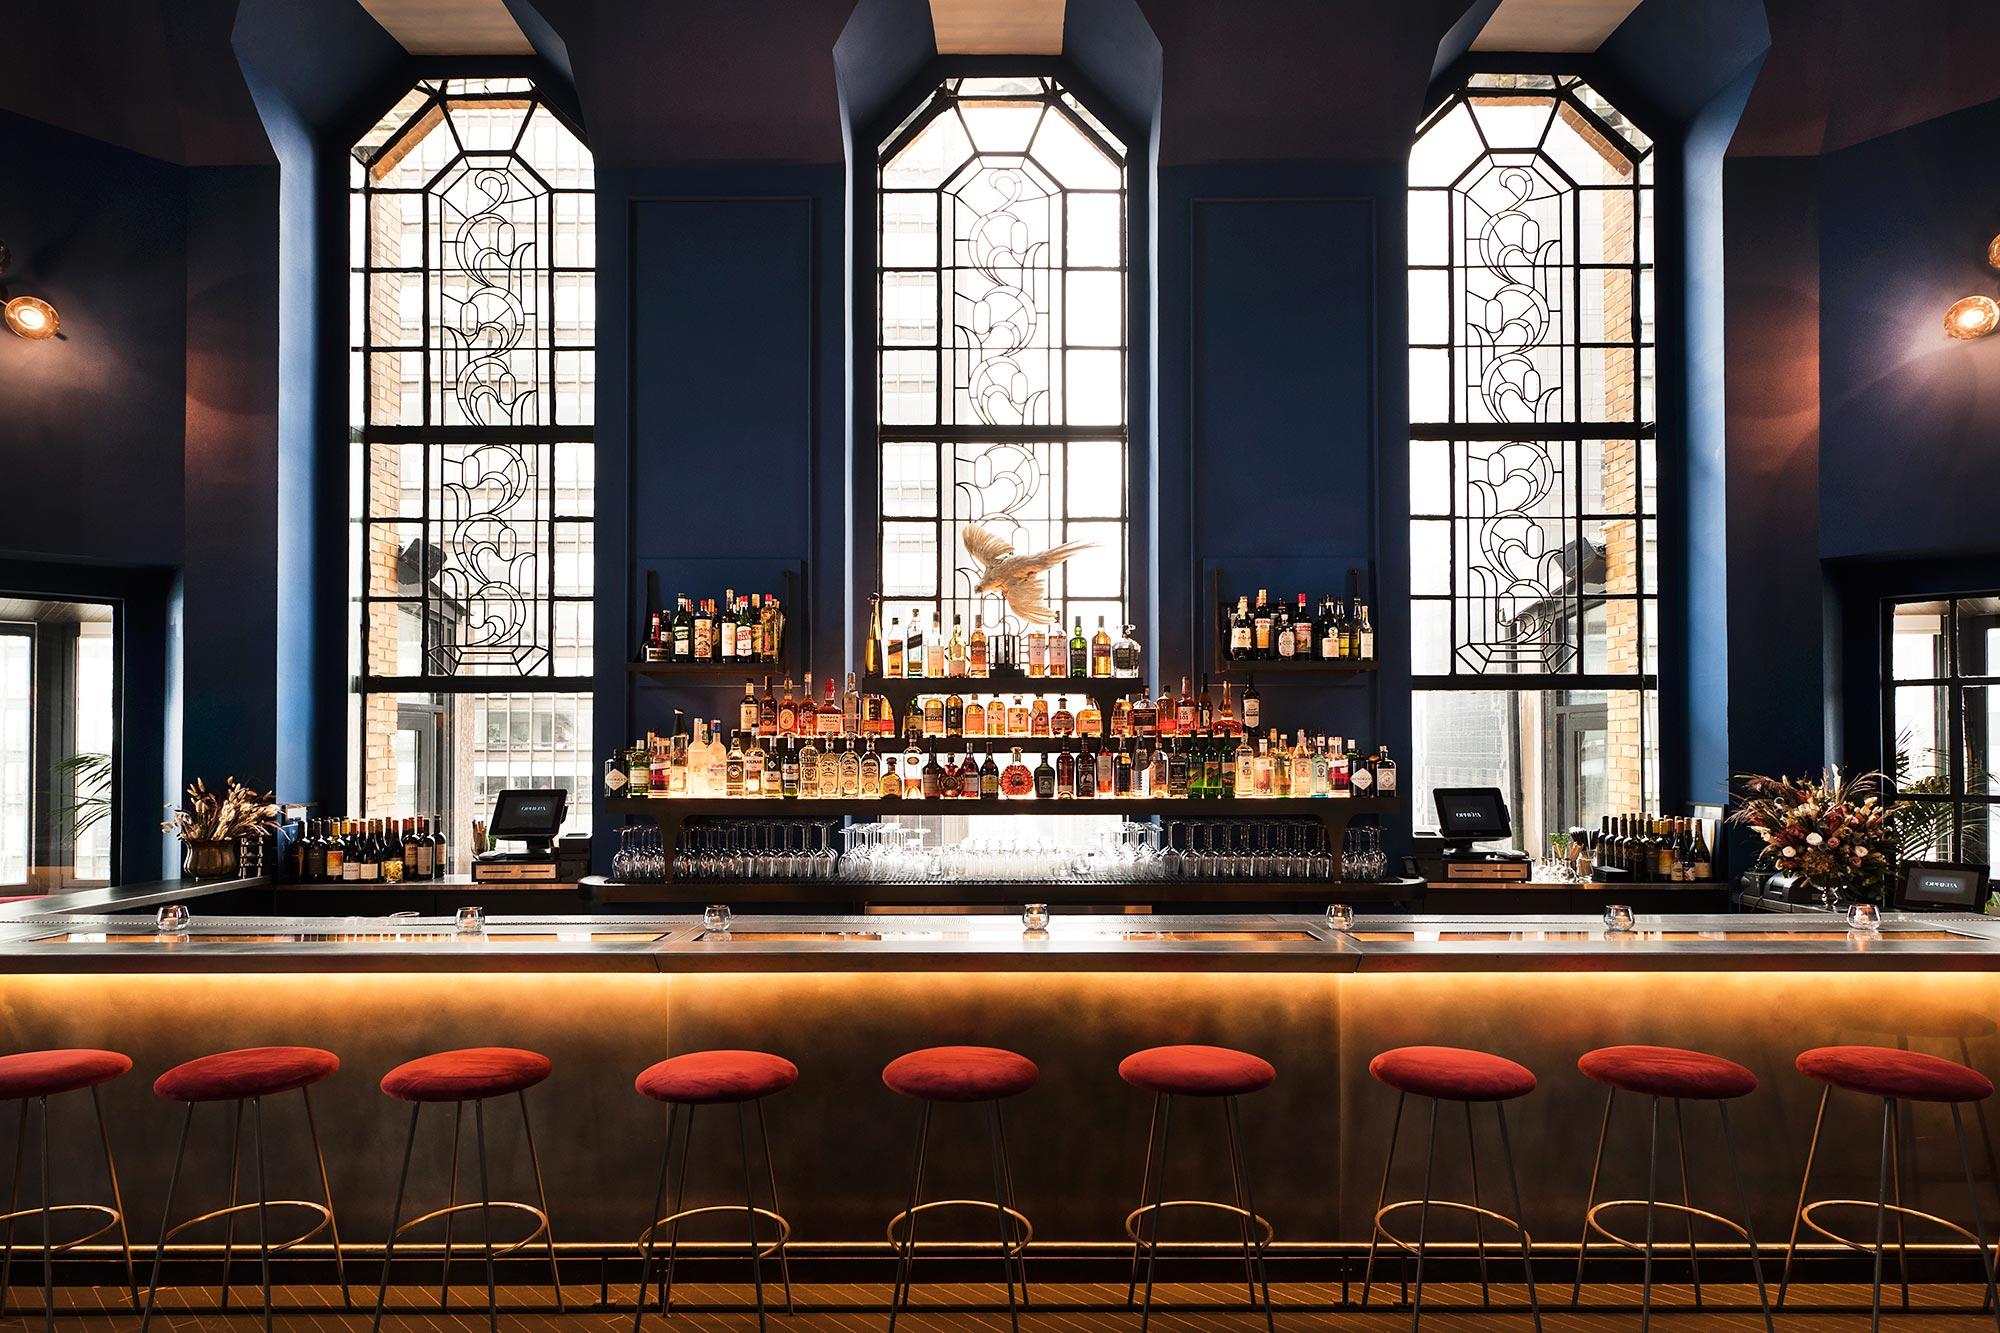 Bar Stools & Chairs -